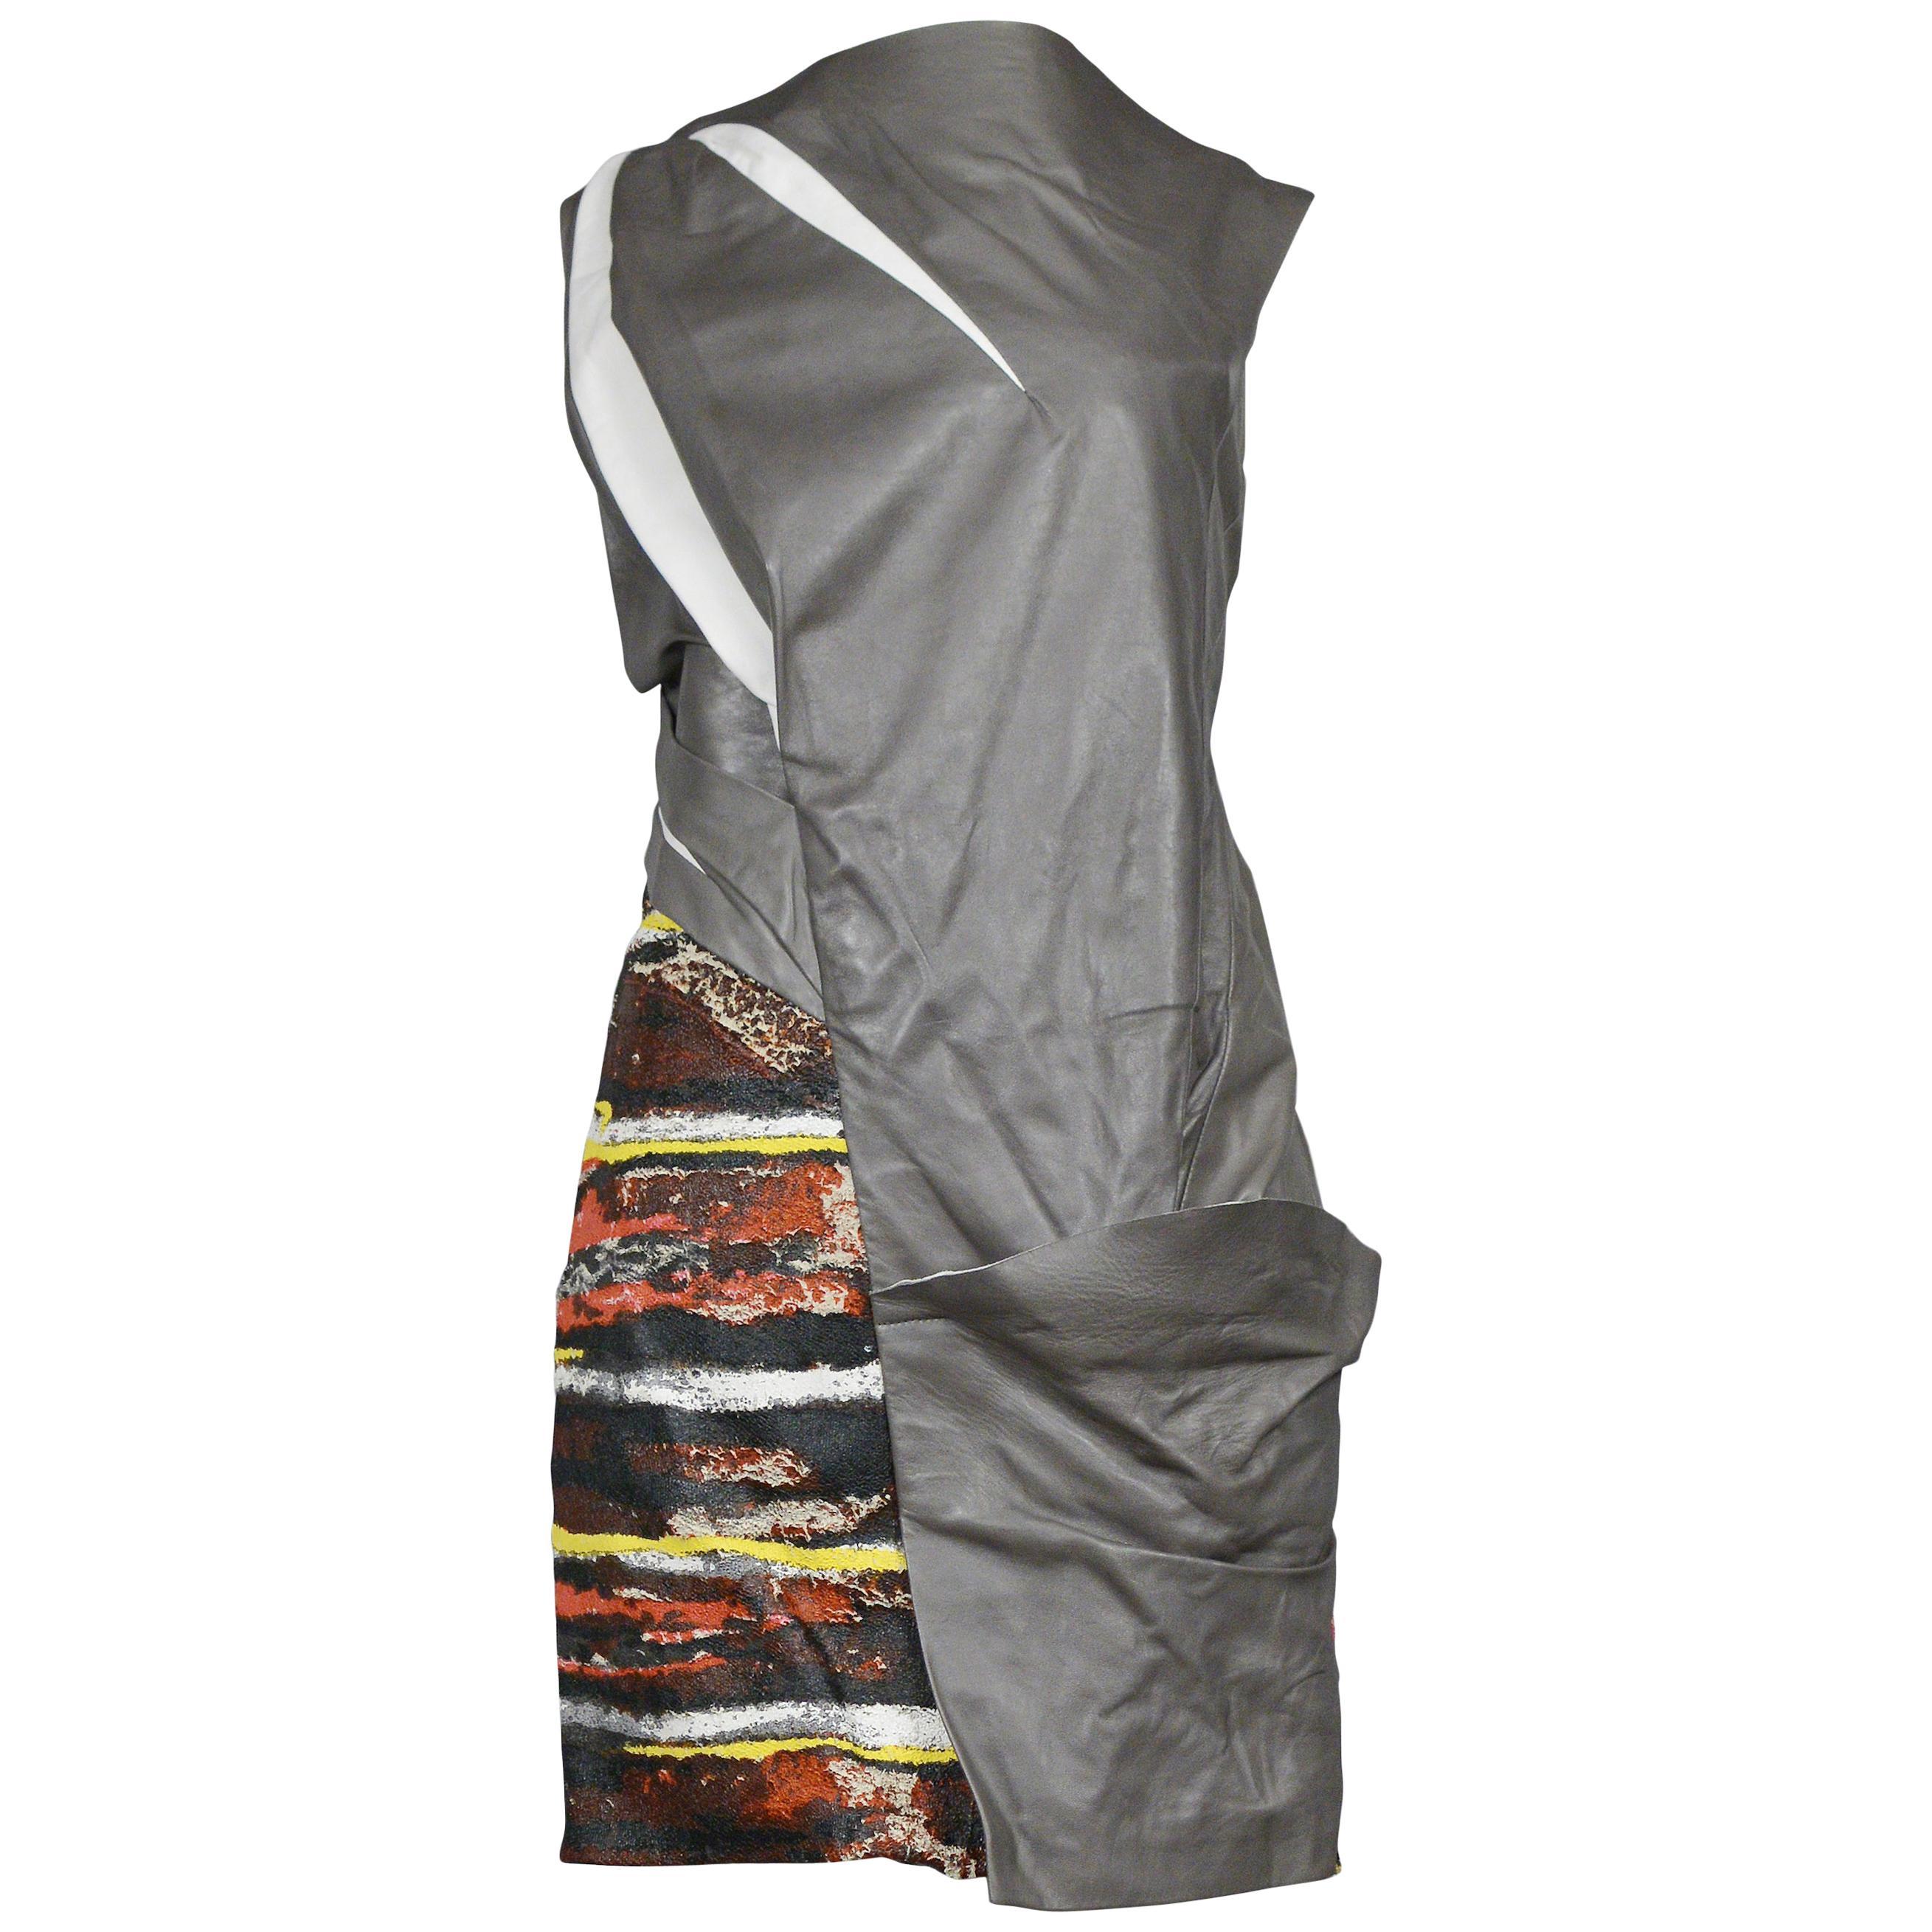 Balenciaga Futuristic Grey Leather & Print Dress 2010